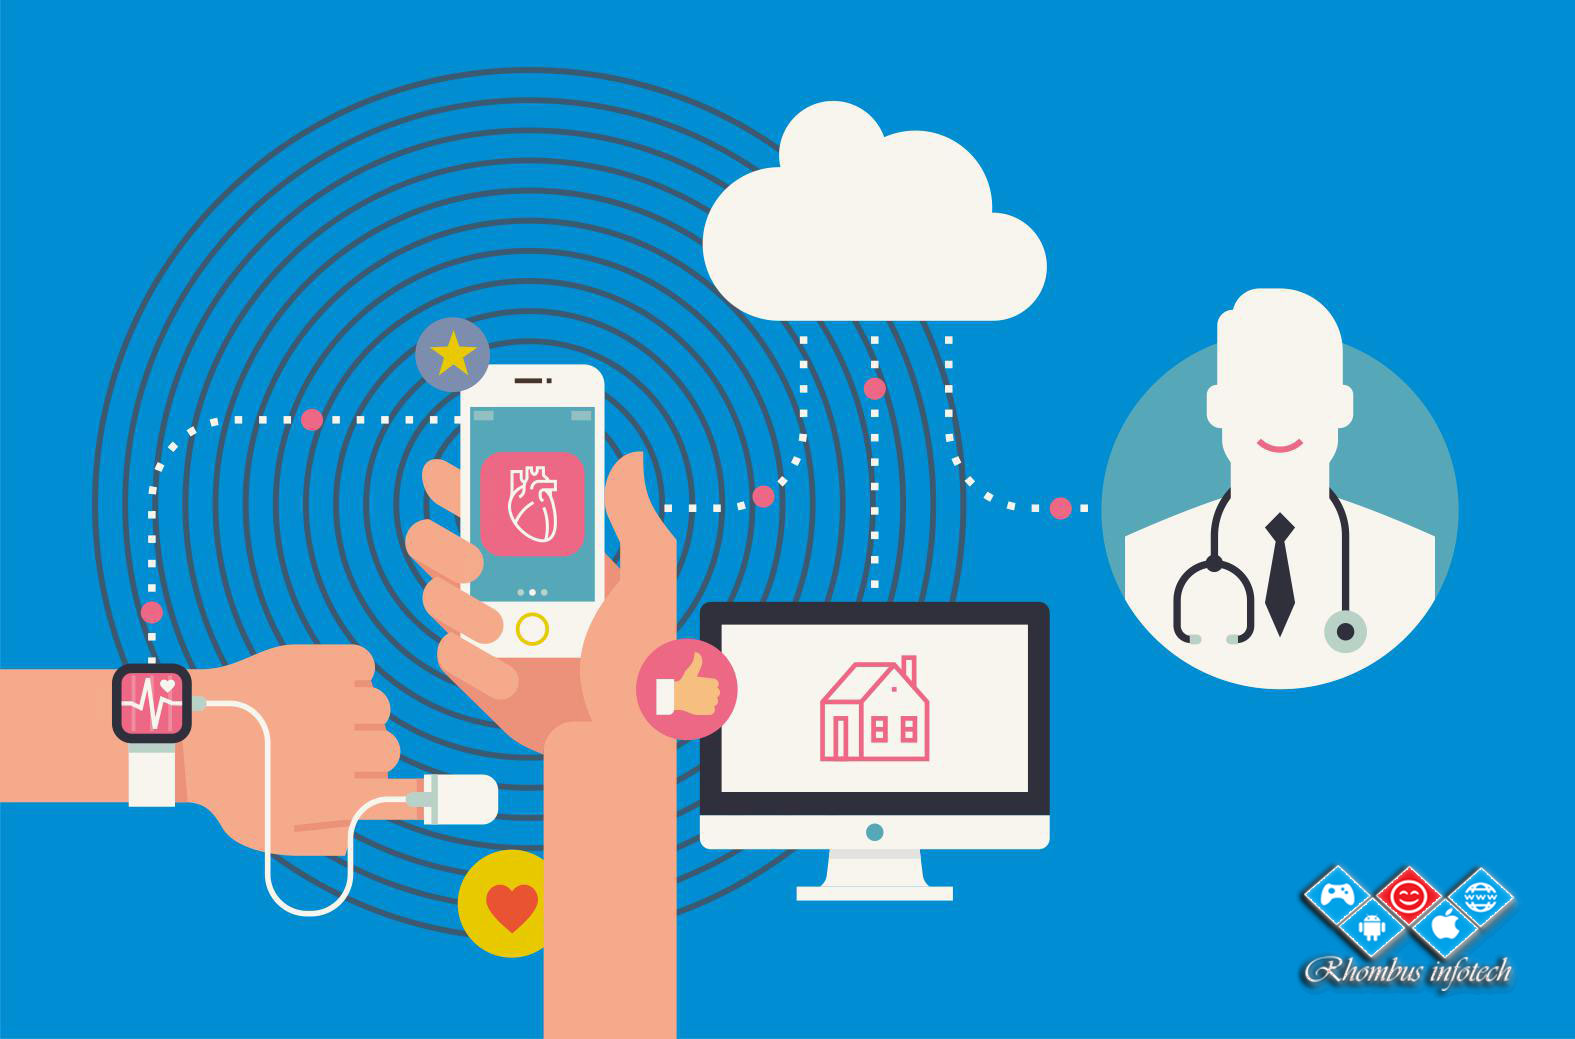 internet-of-things-benefits-in-healthcare-nursing